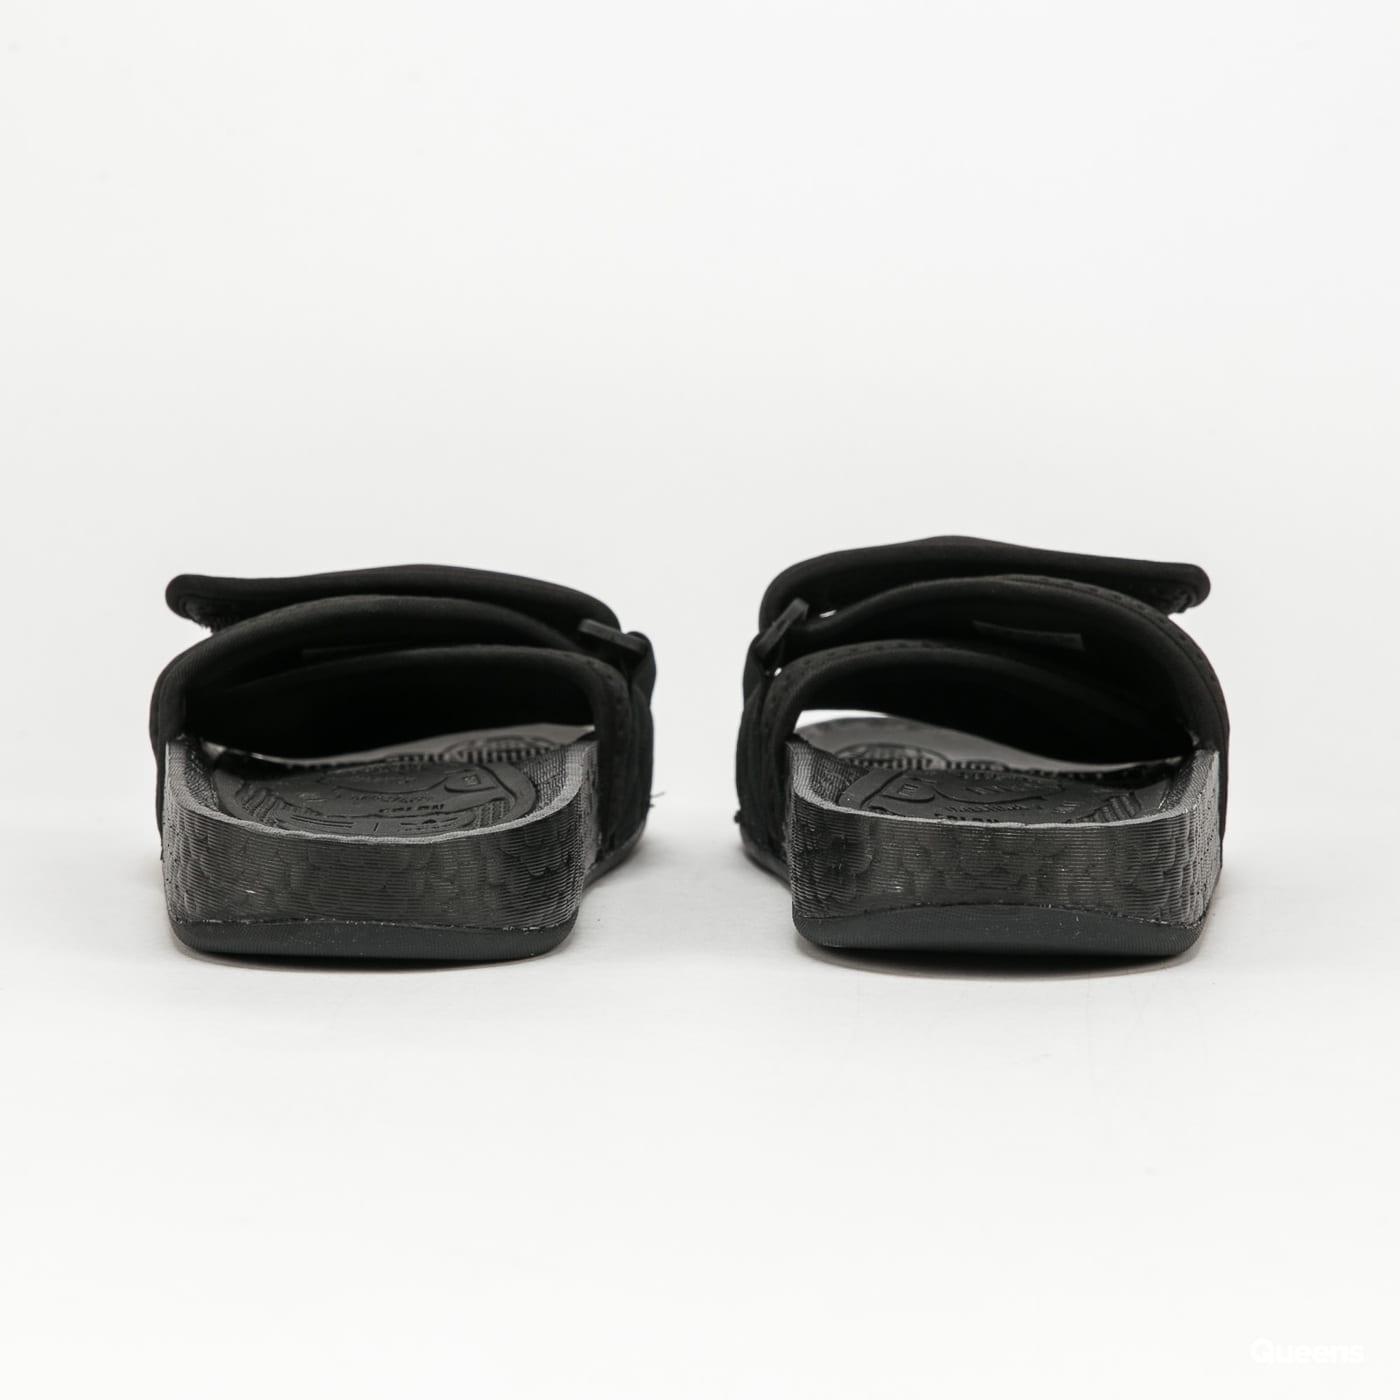 adidas Originals Pharrell Williams Chancletas HU cblack / cblack / cblack